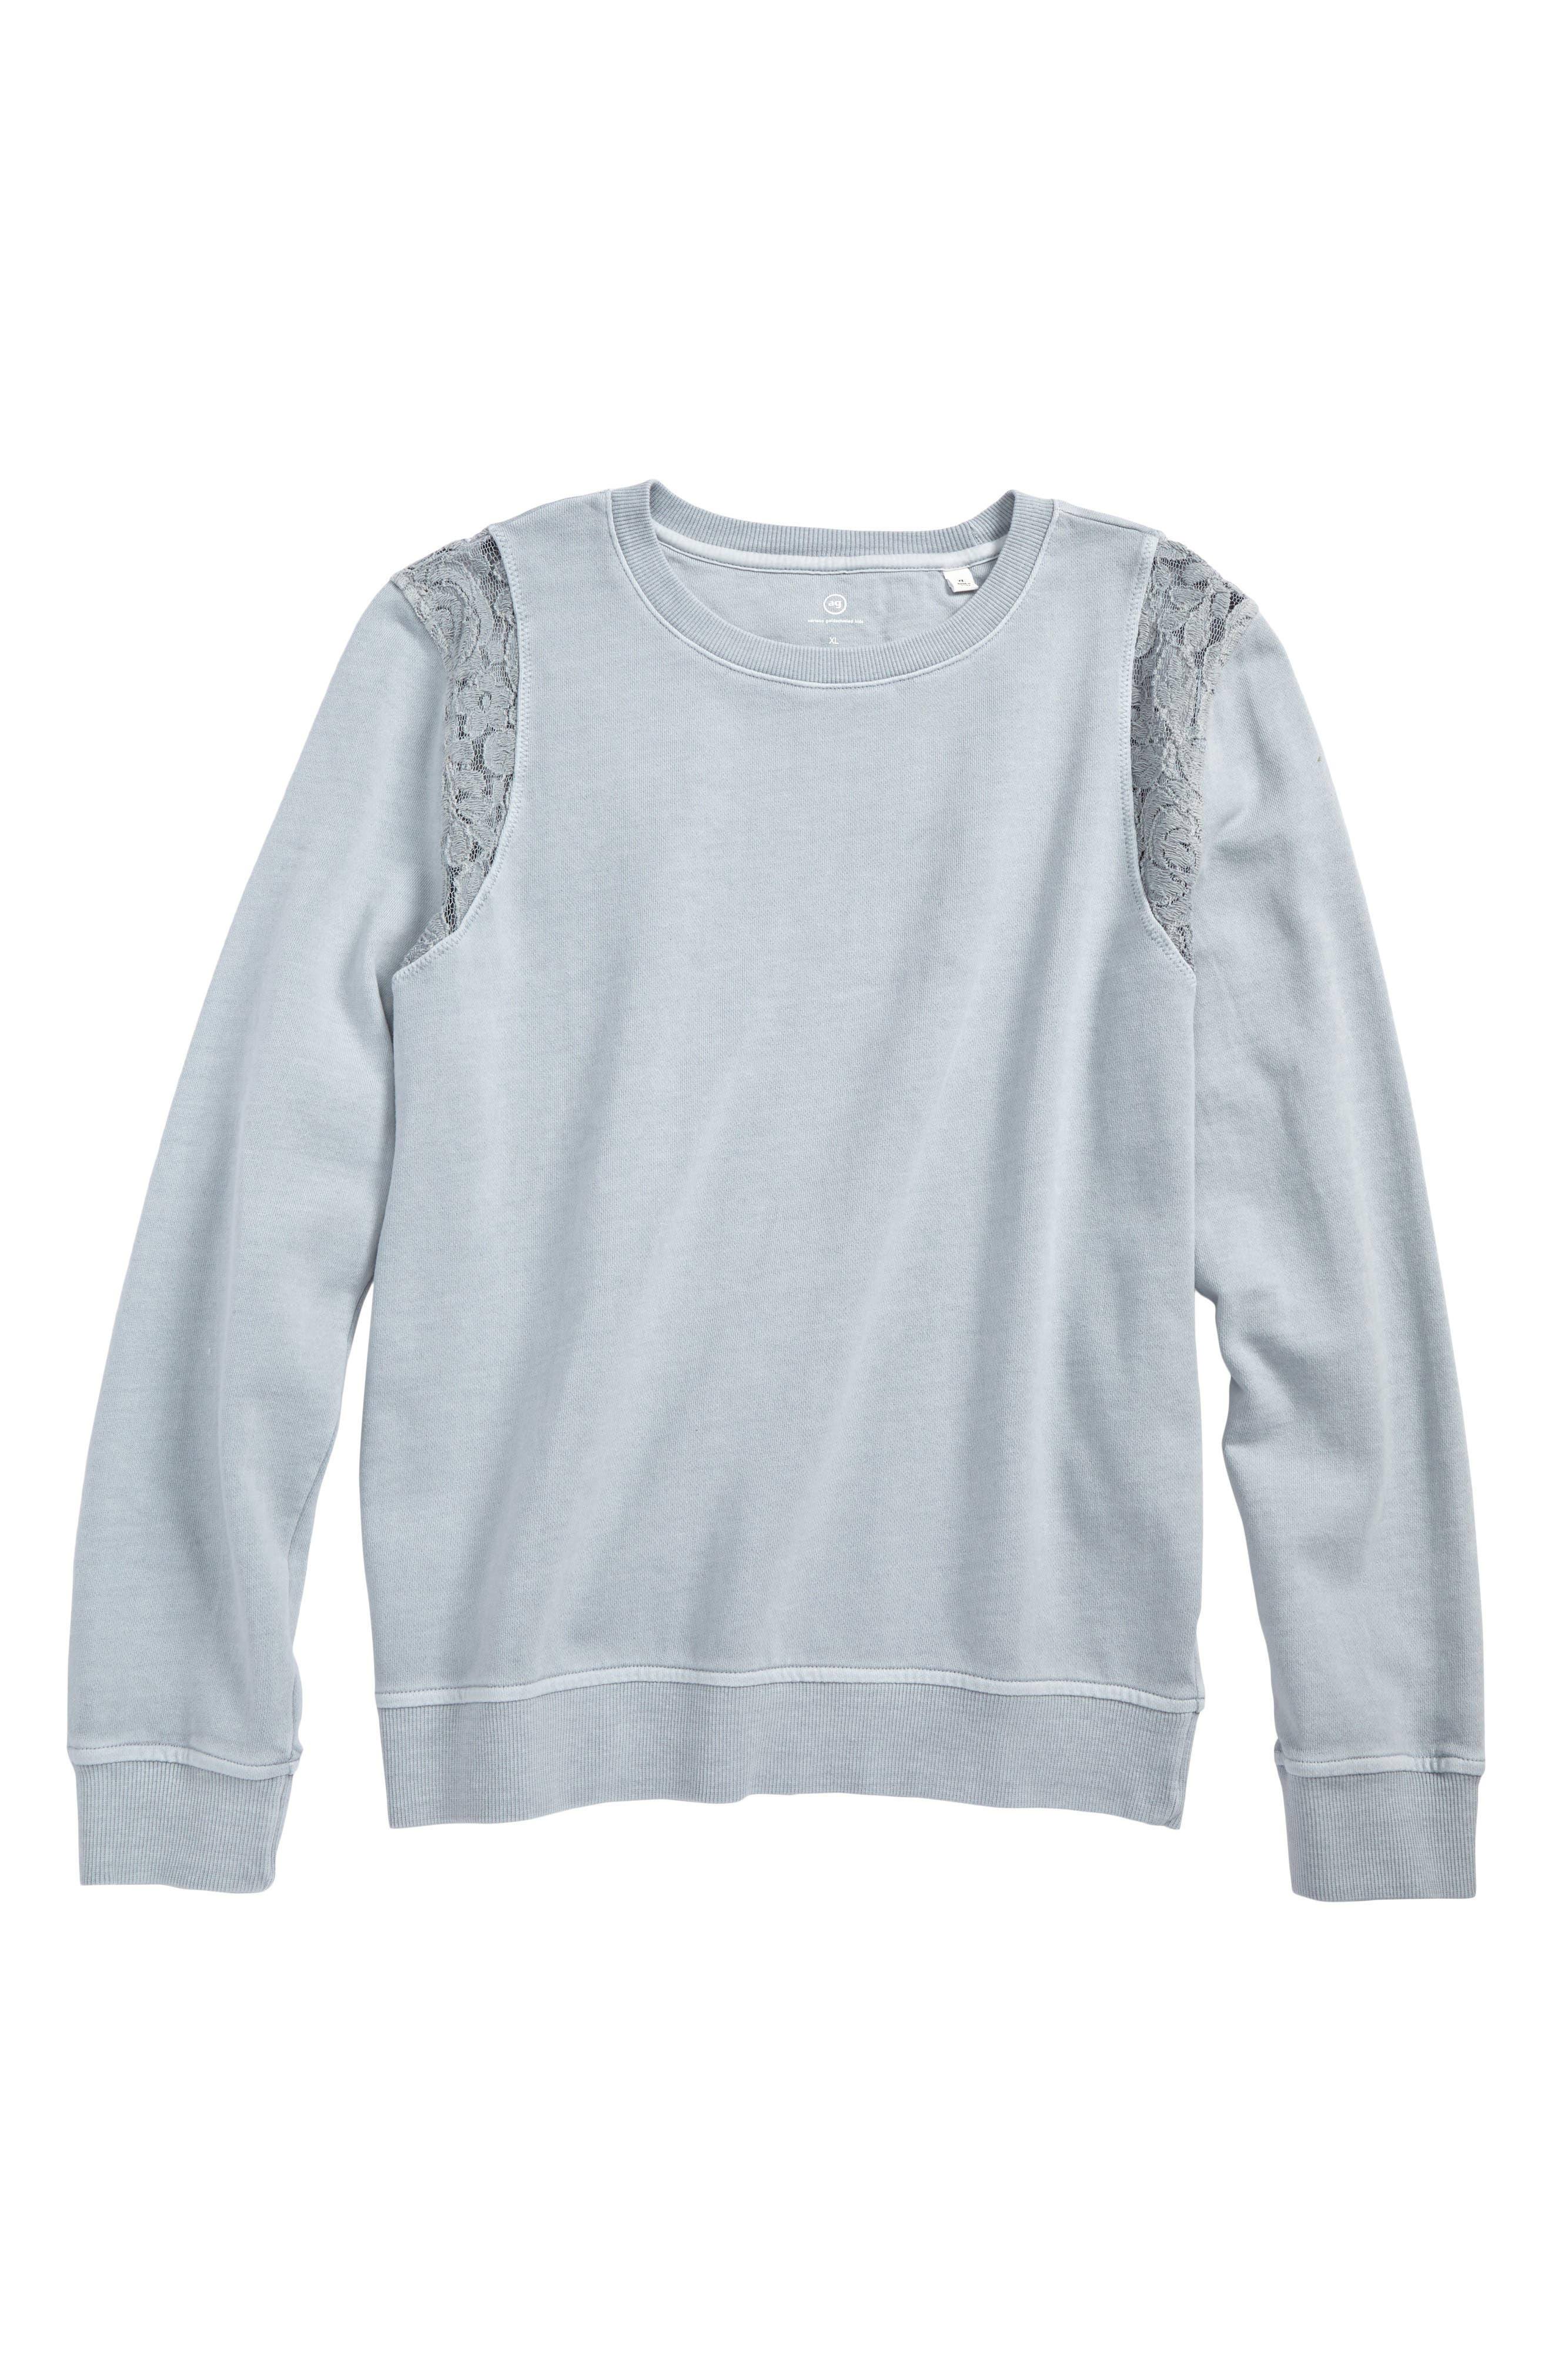 Lace Sweatshirt,                             Main thumbnail 1, color,                             098